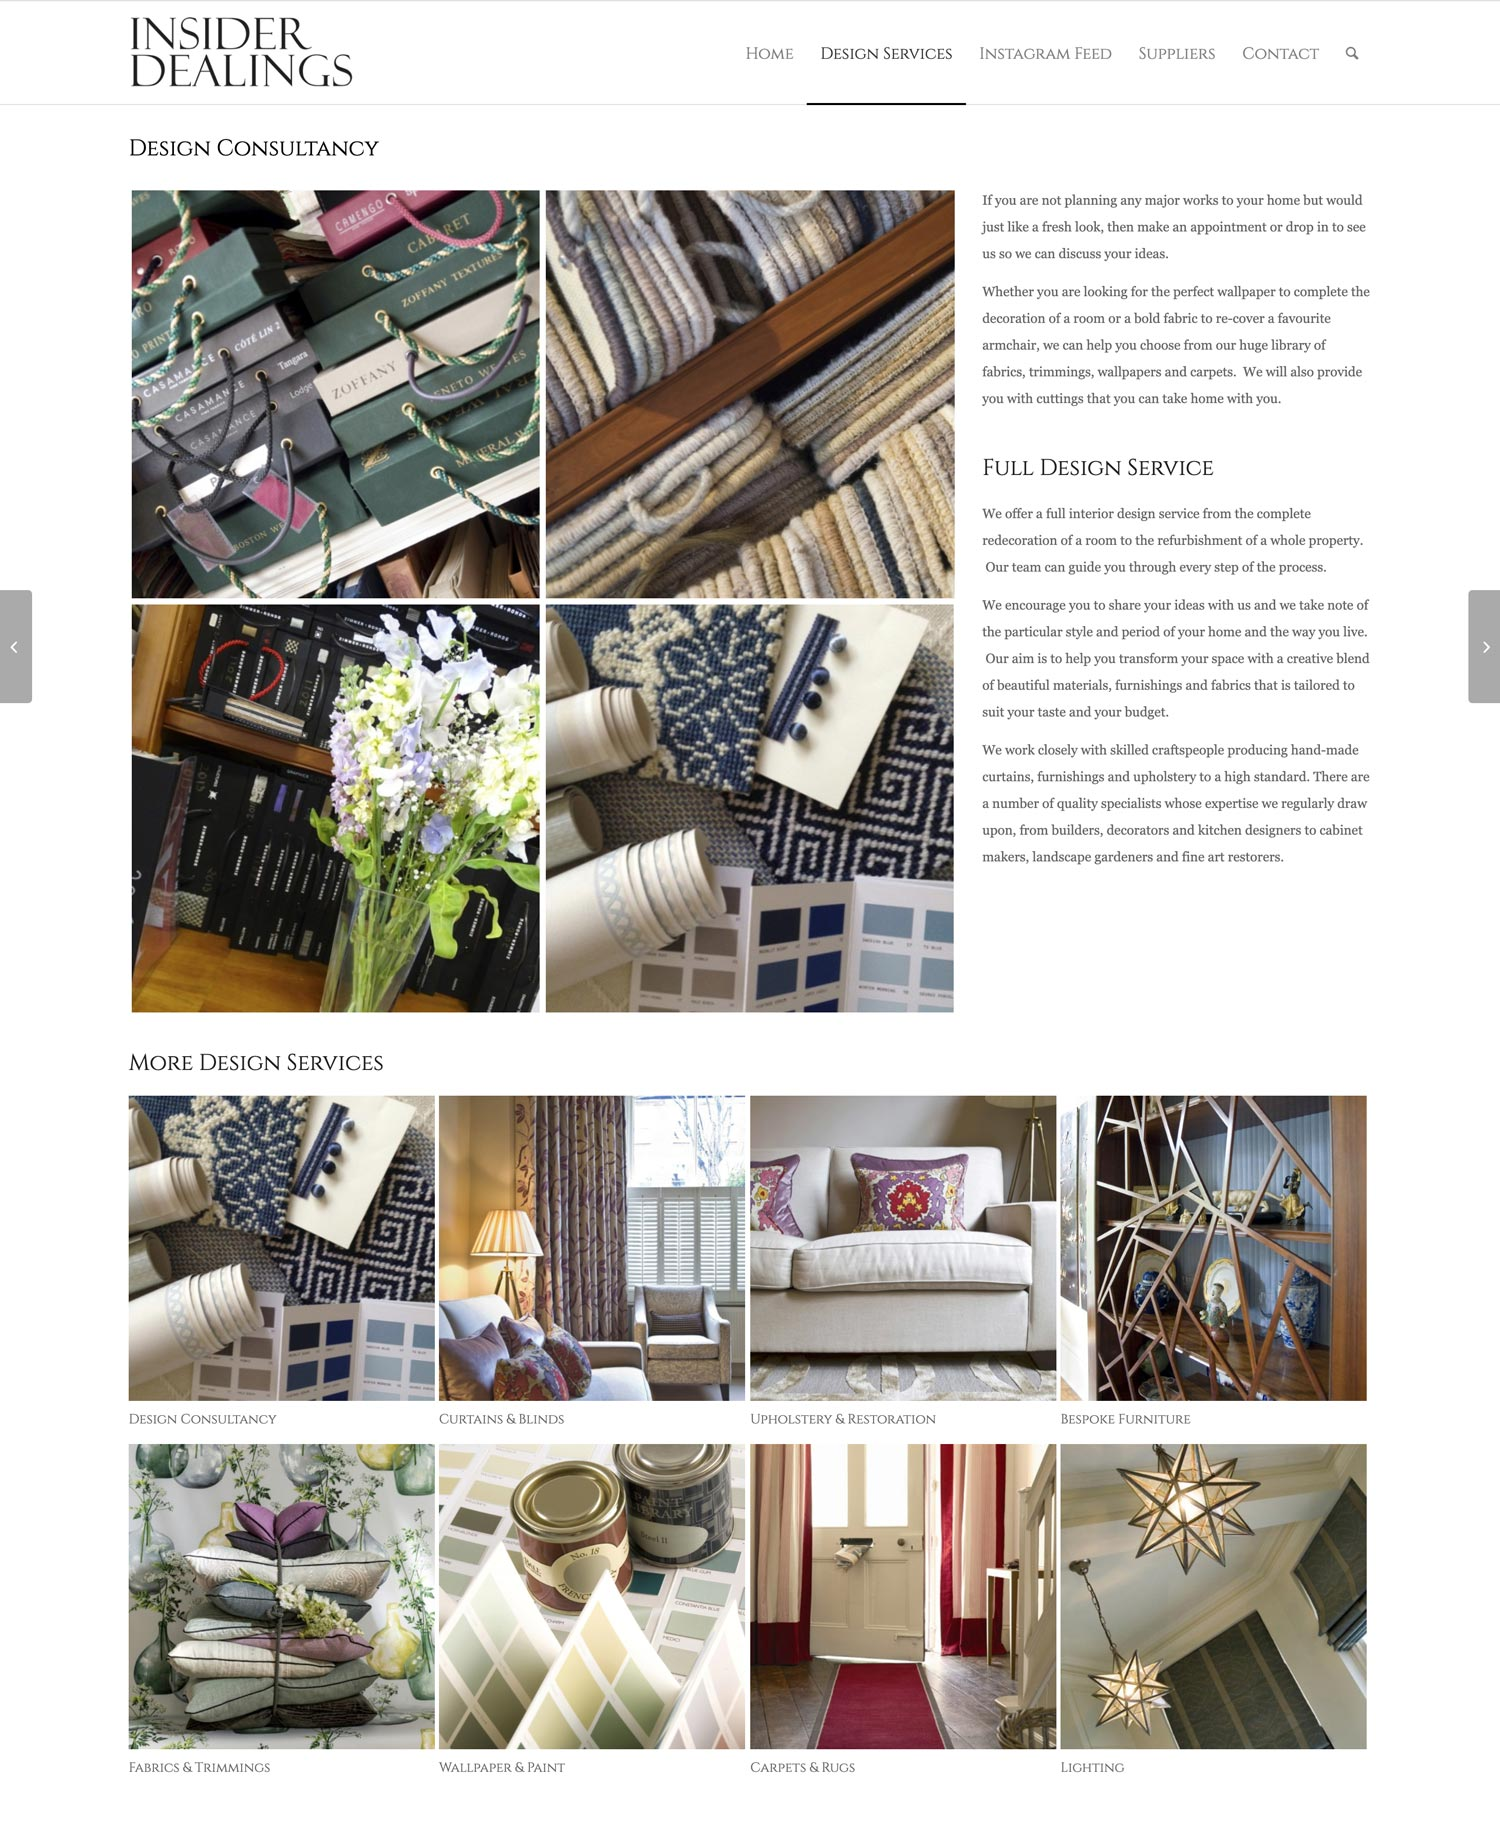 Insider Dealings Website Design Consultancy